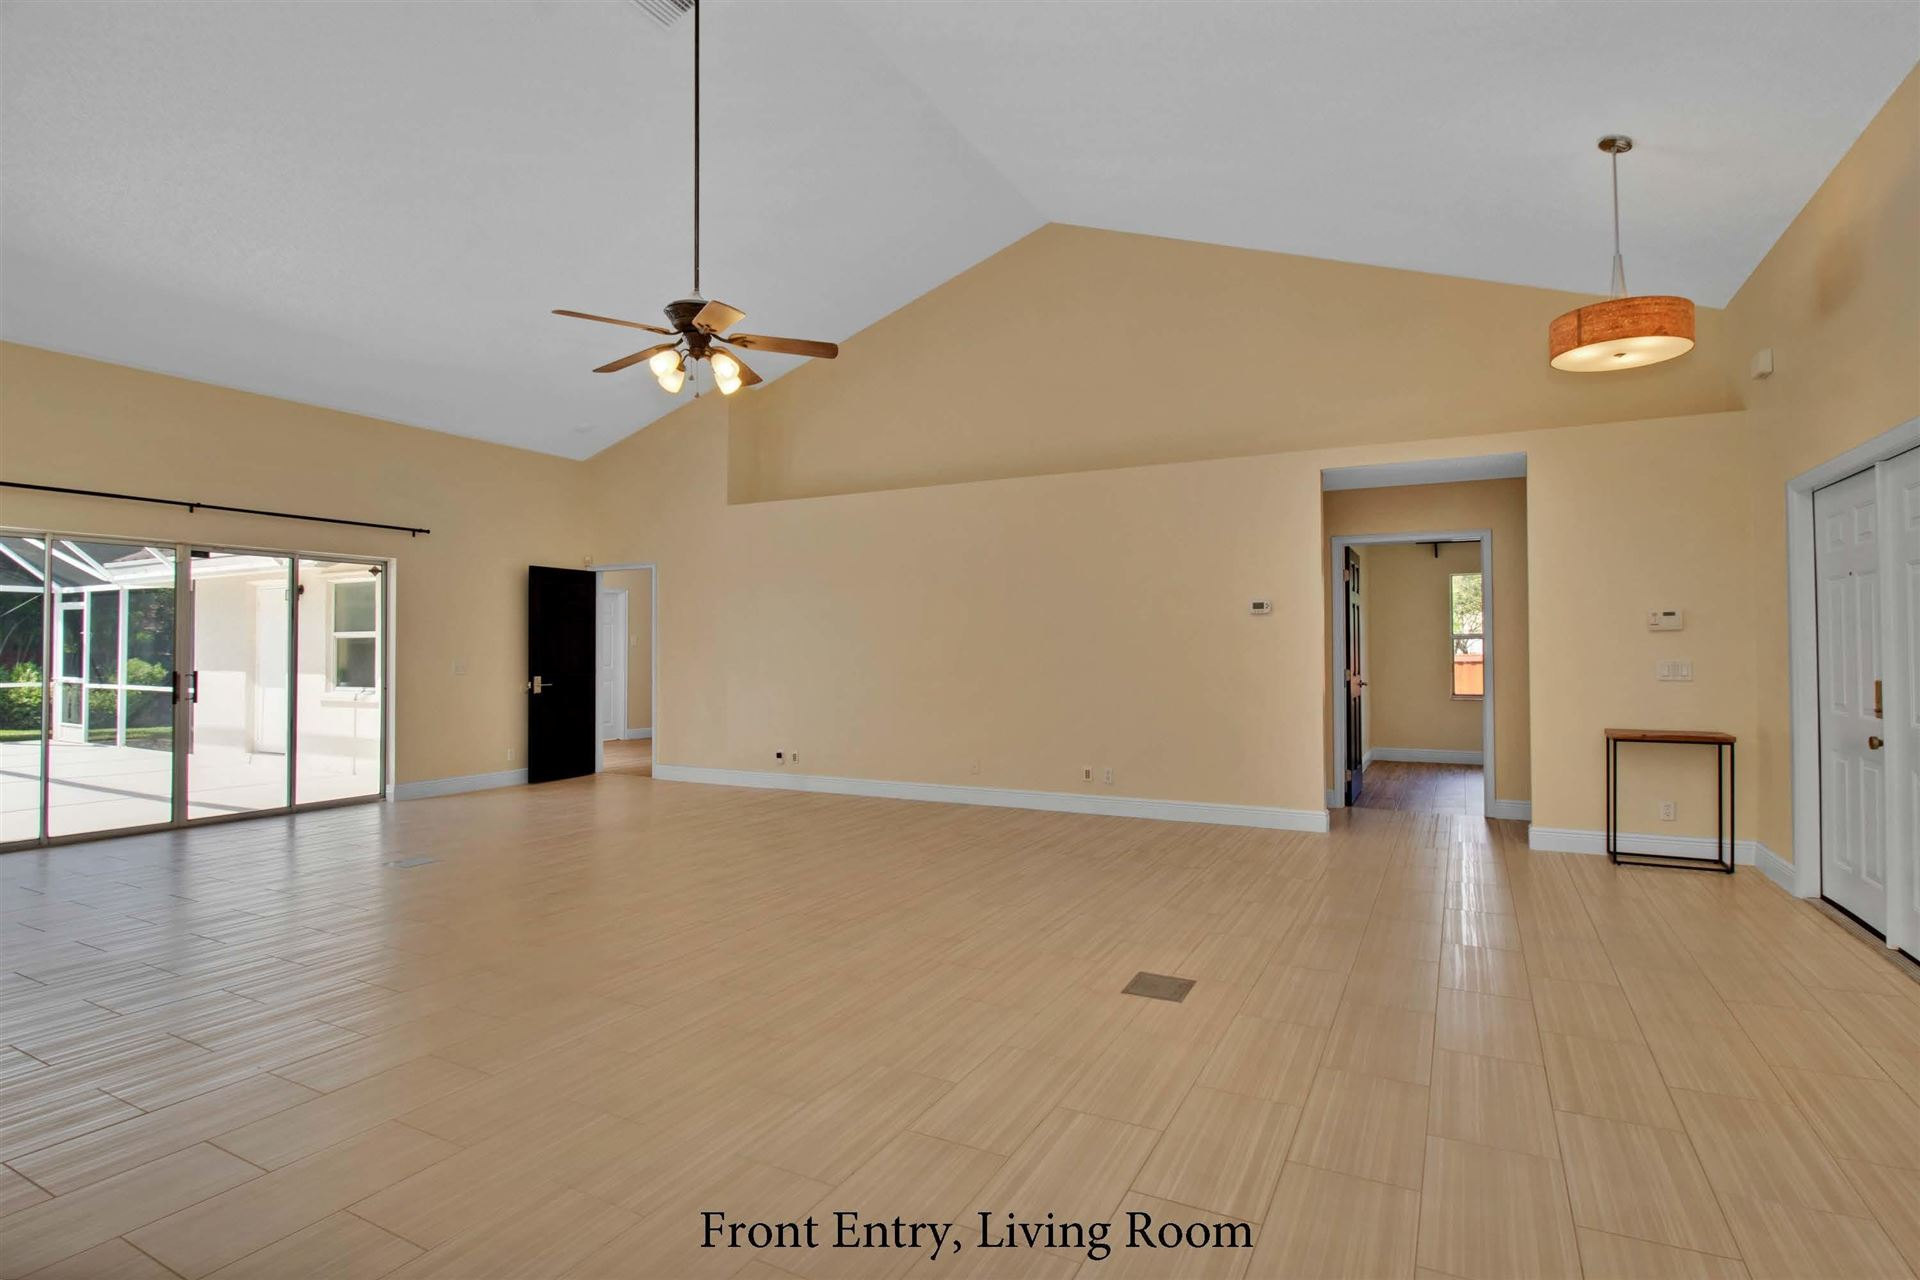 Photo of 16340 NW 11th Street, Pembroke Pines, FL 33028 (MLS # RX-10733641)